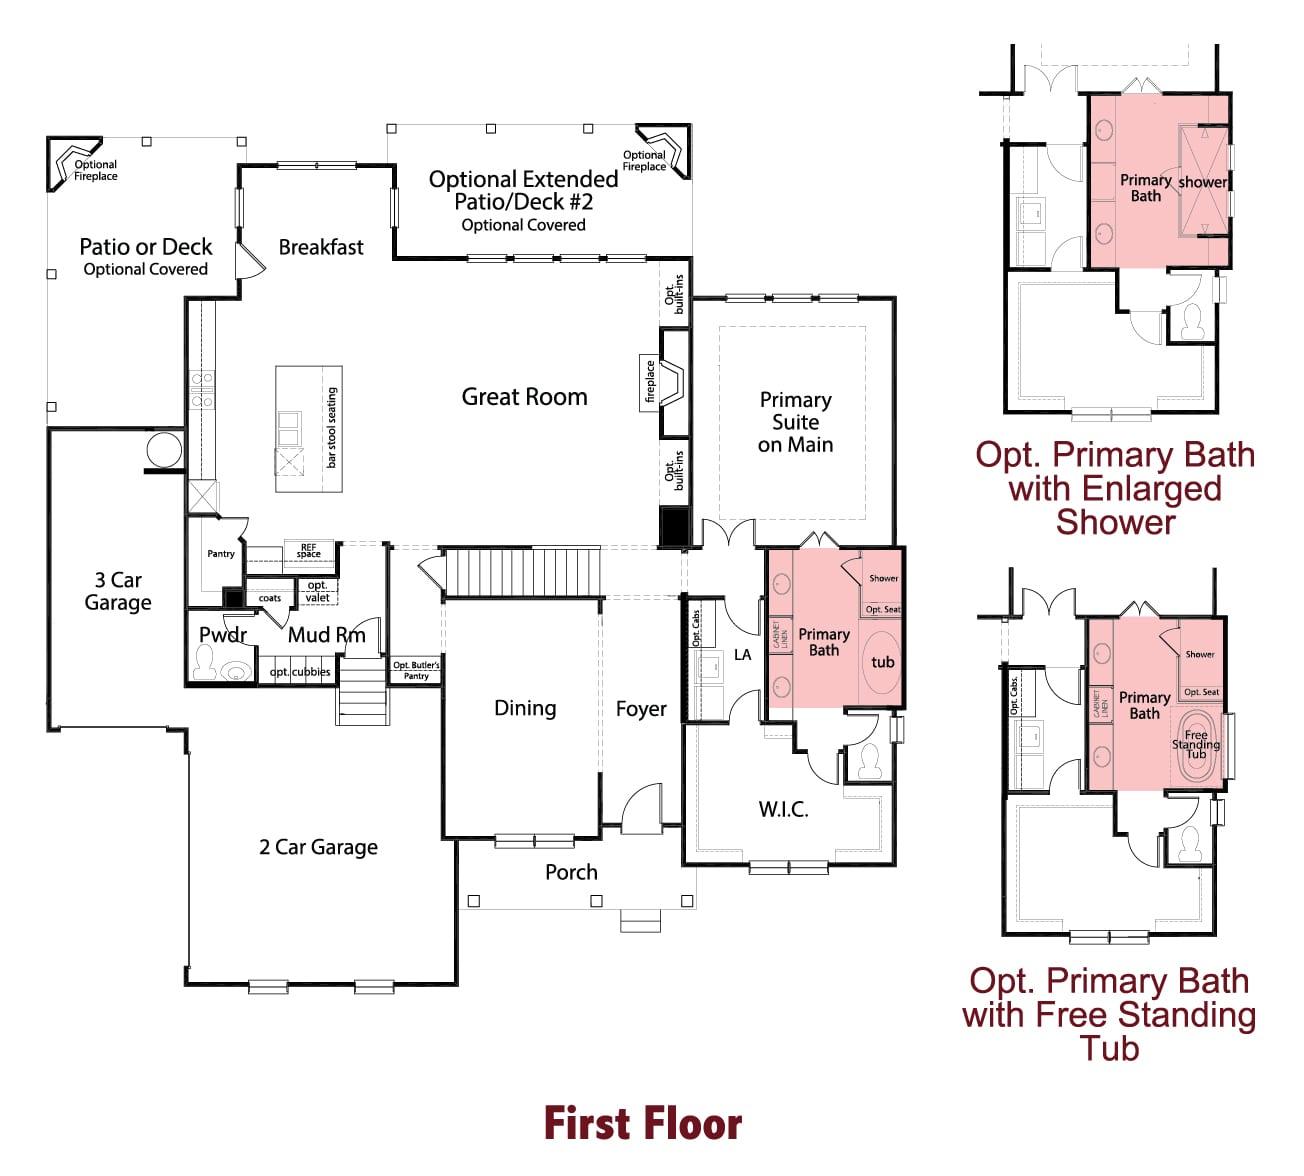 Prescot plans Image